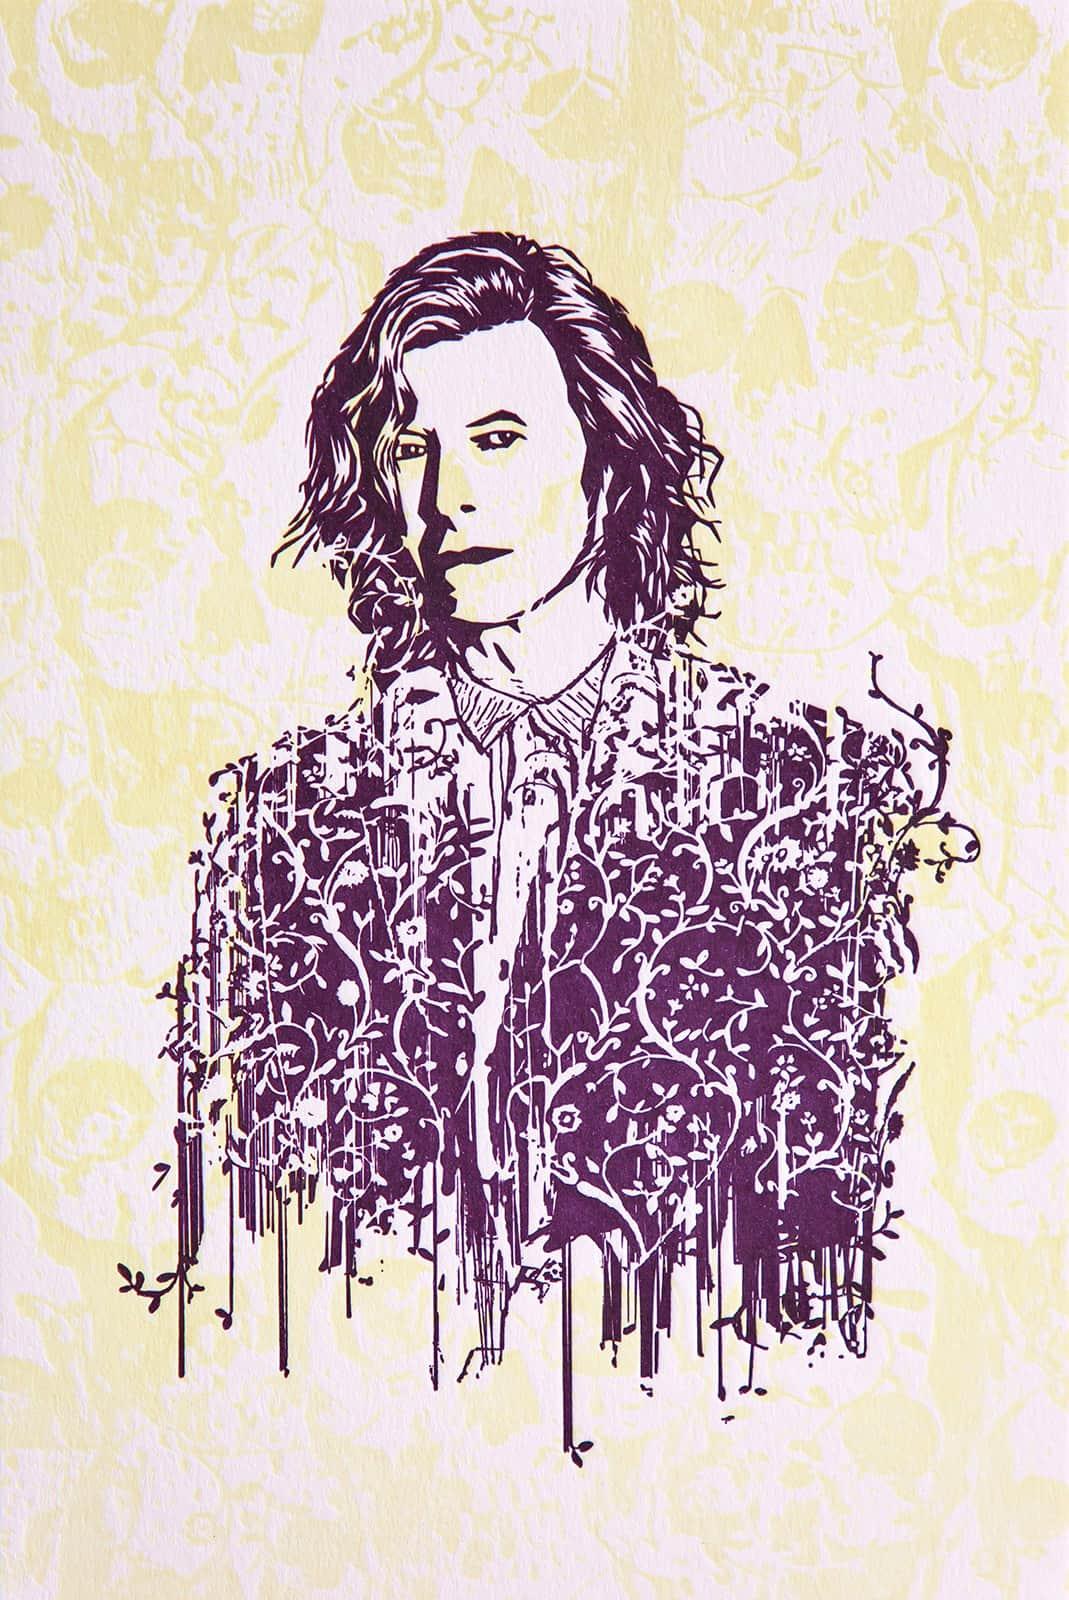 Bowie-Art-Print-Letterpress-mydeath-0